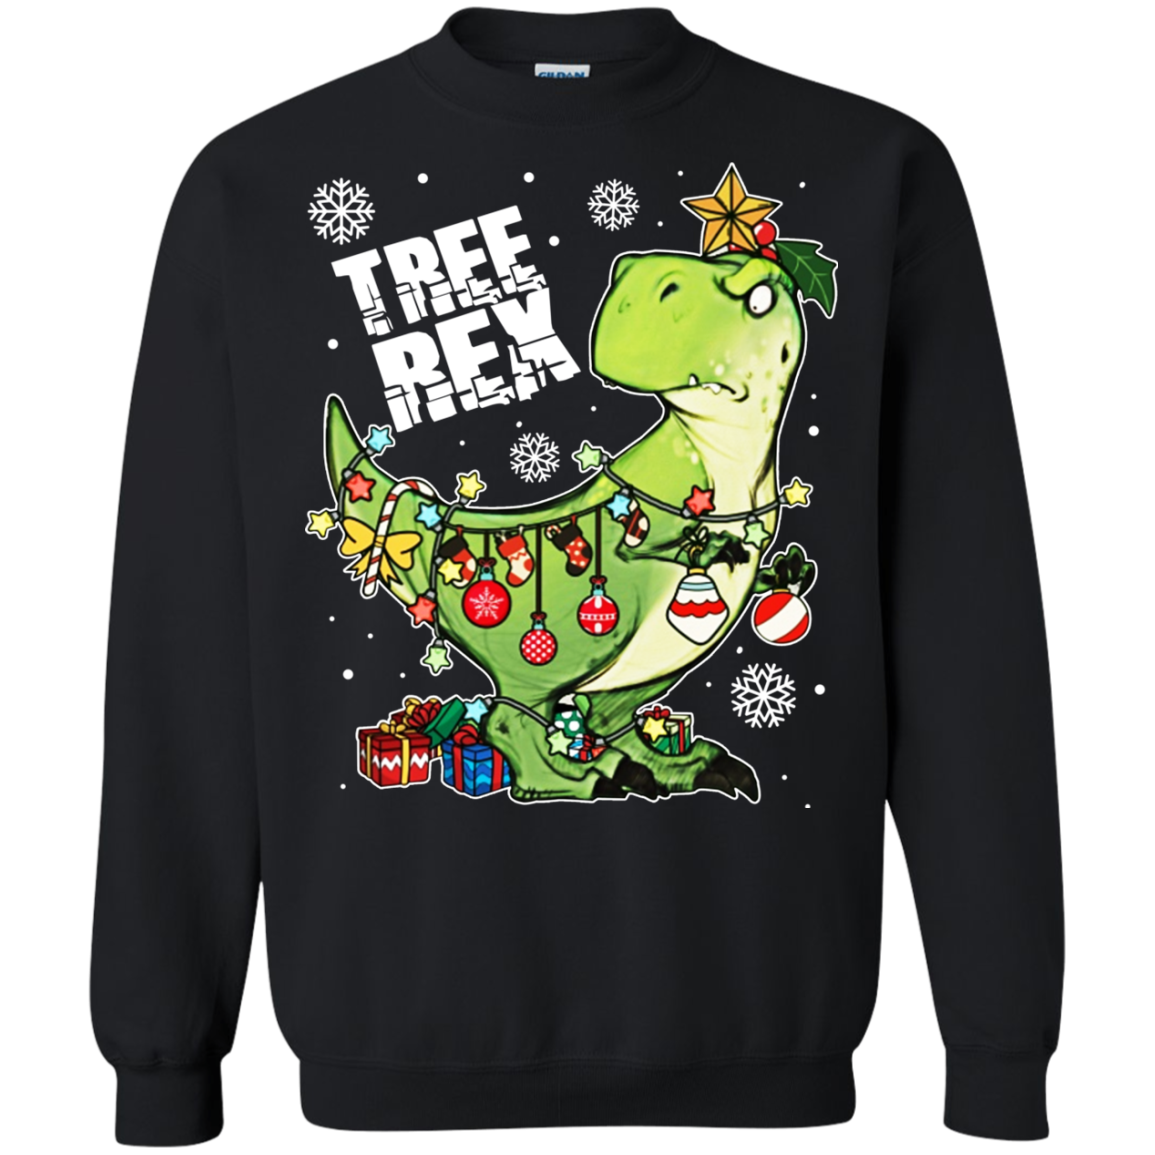 Préférence T-rex - Tree Rex Christmas Shirt, Sweatshirt | Allbluetees.com YI42